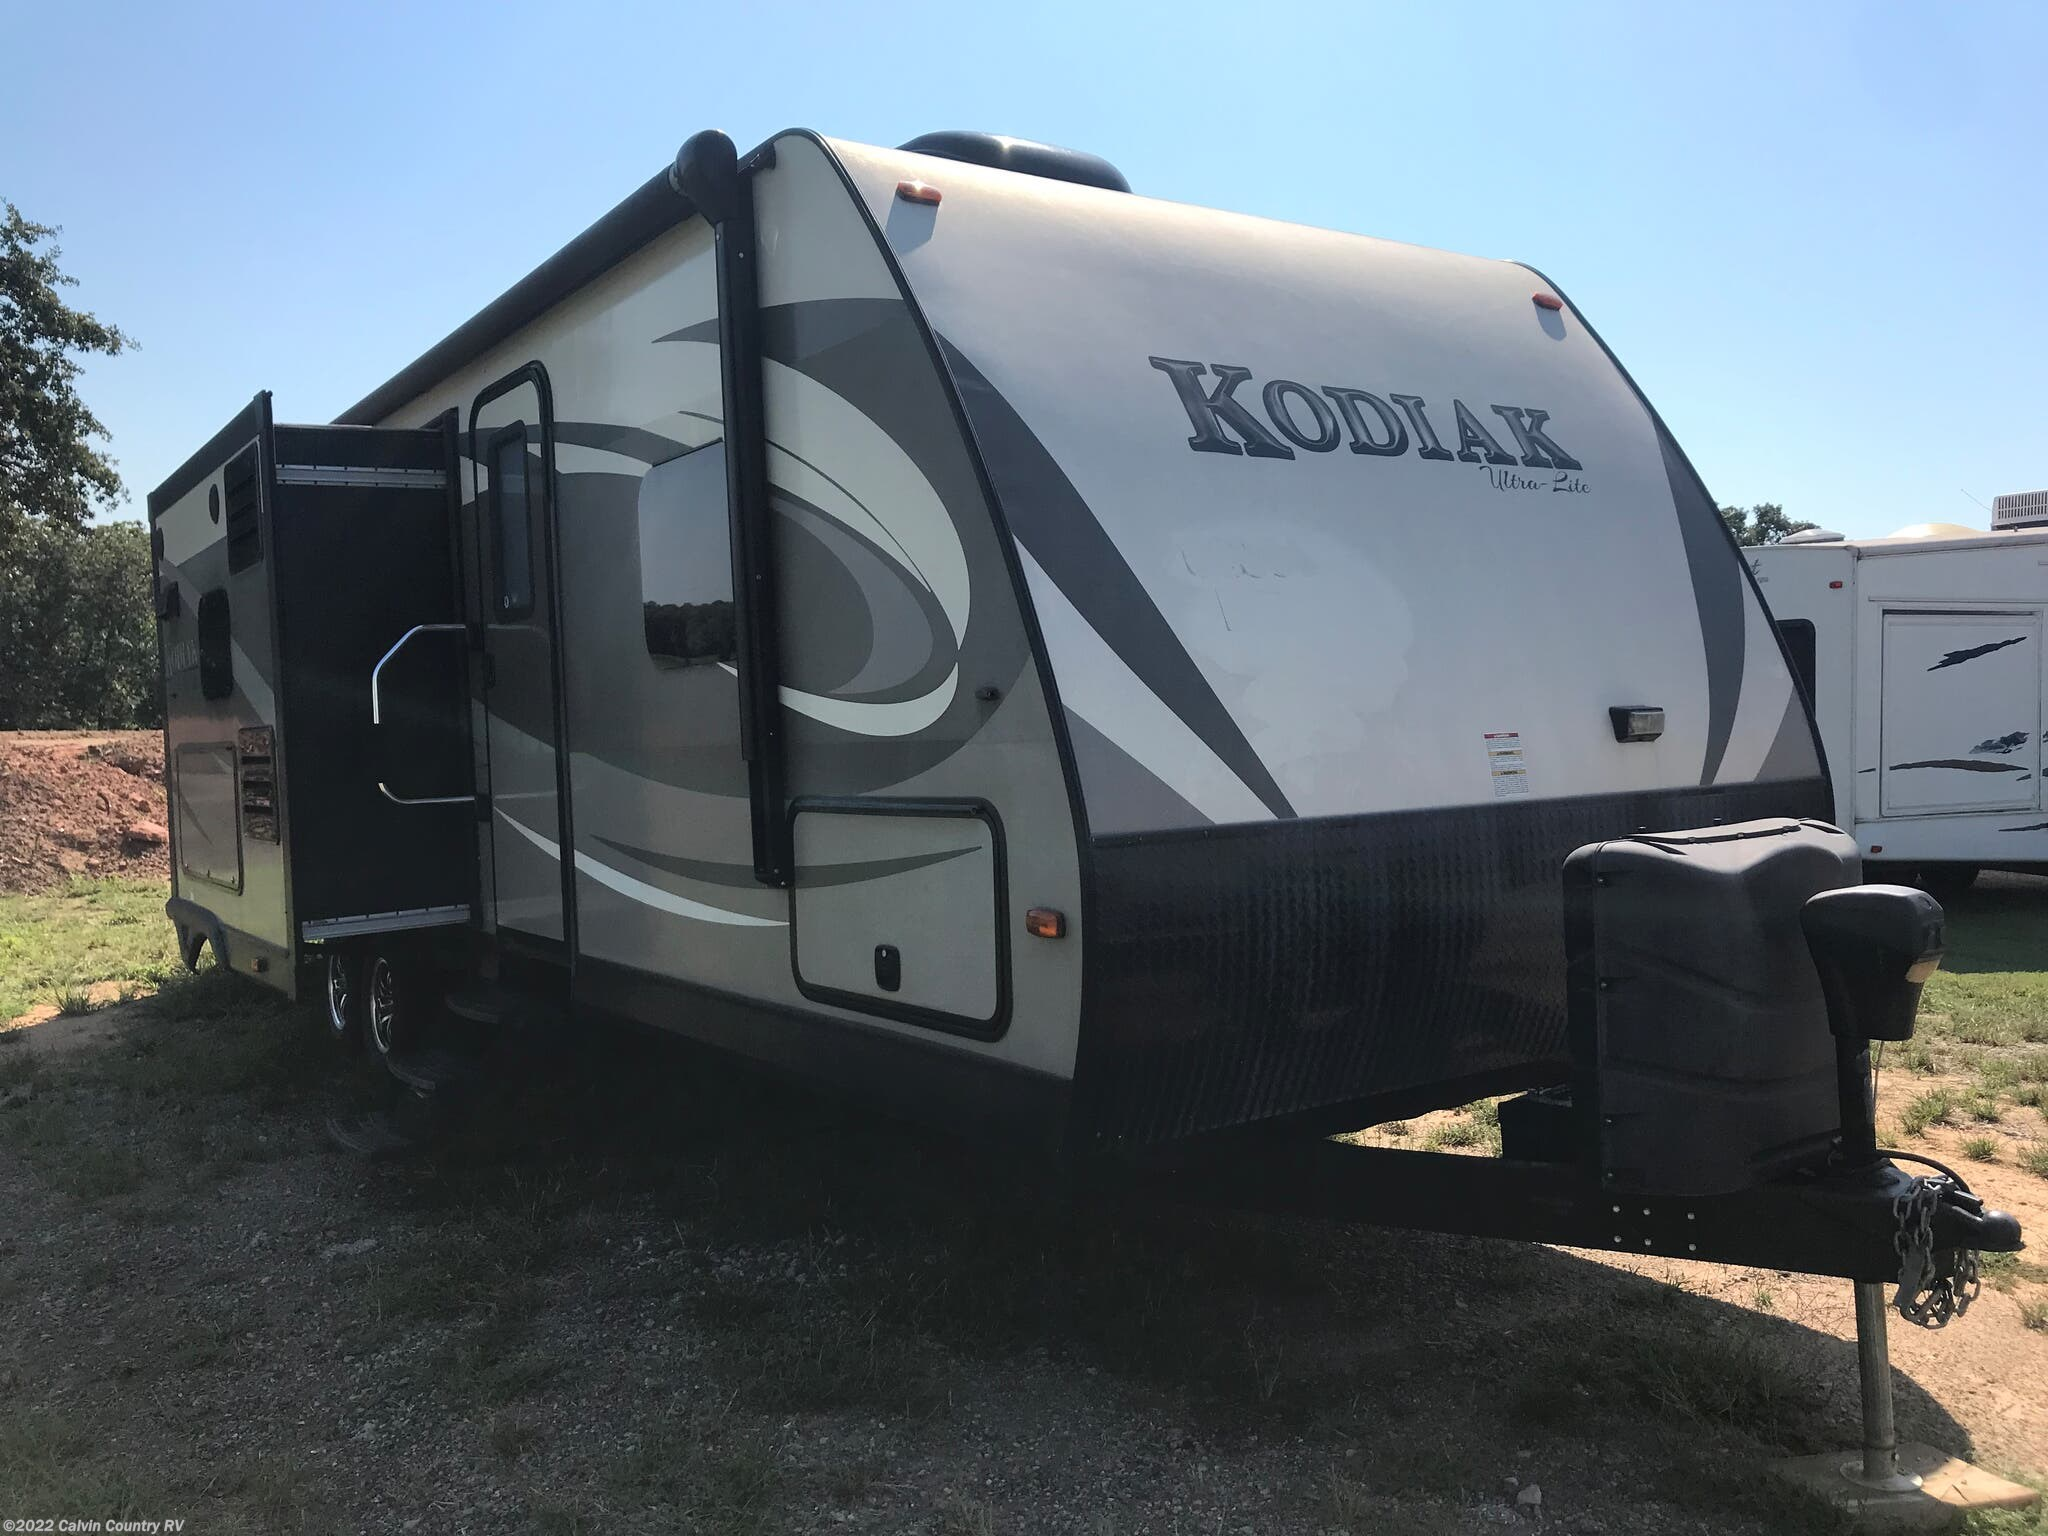 Kodiak Travel Trailer >> 6313819a 2015 Dutchmen Kodiak 276bhsl For Sale In Depew Ok